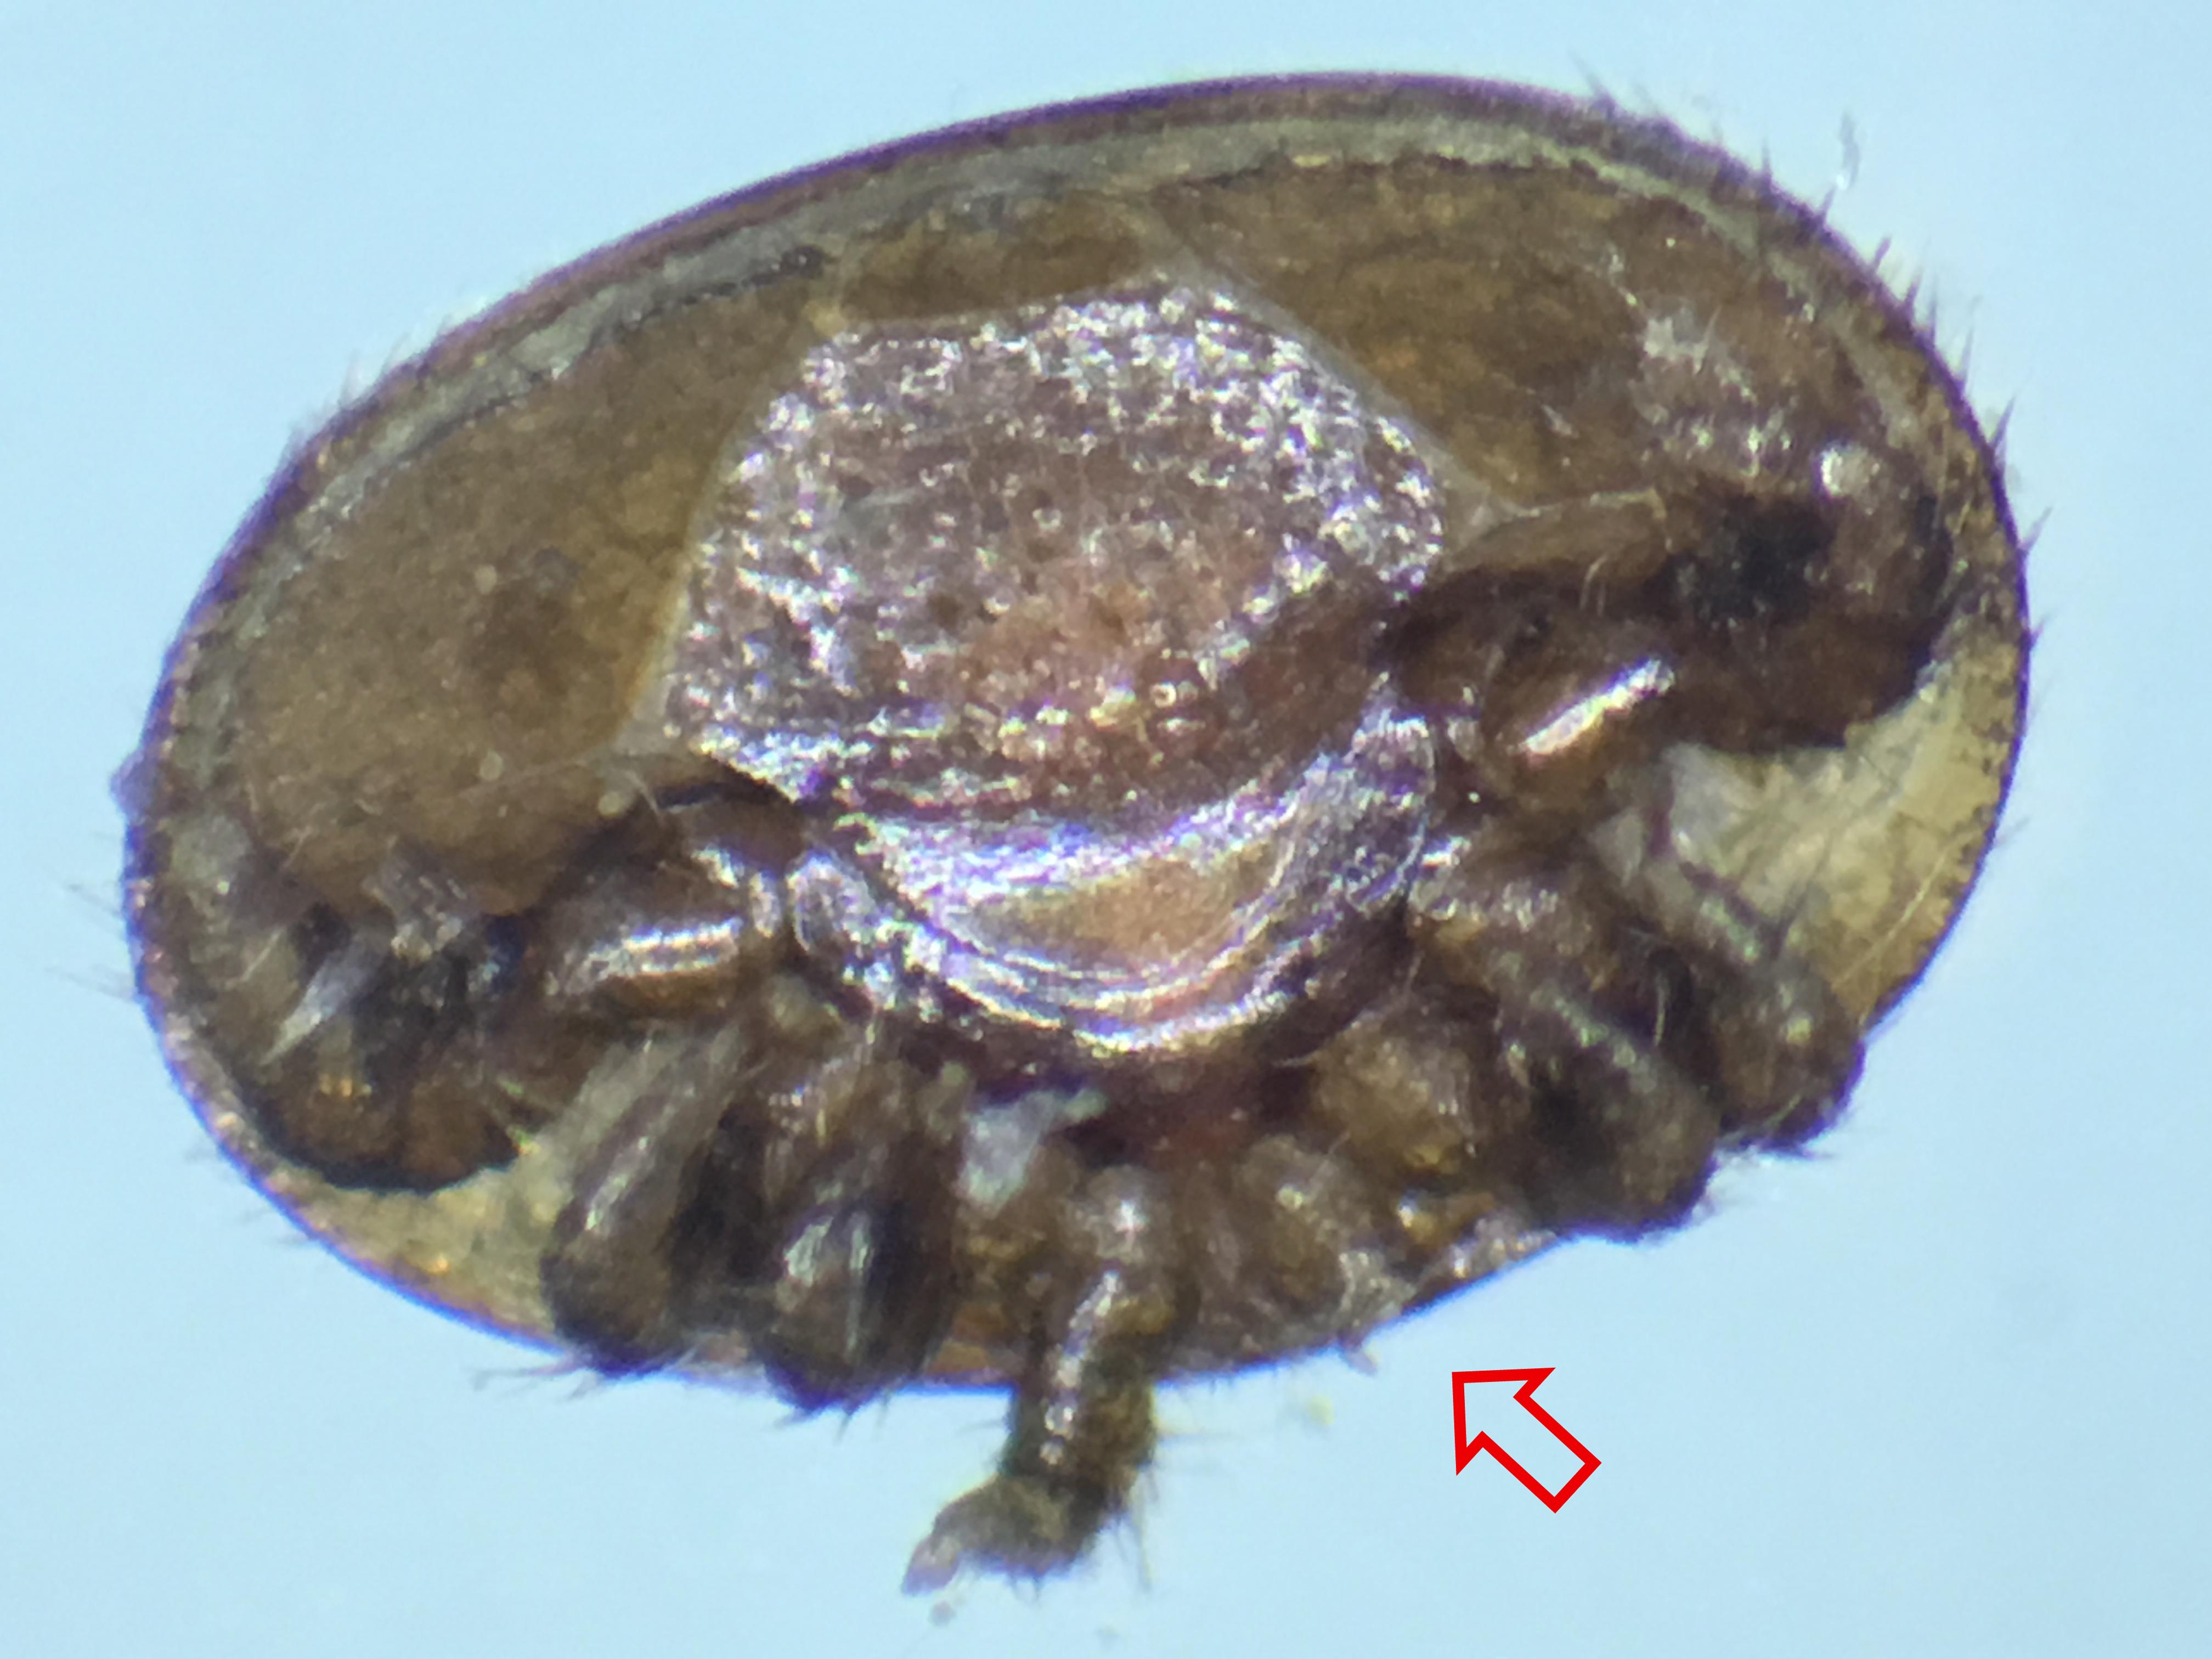 groomed varroa mite